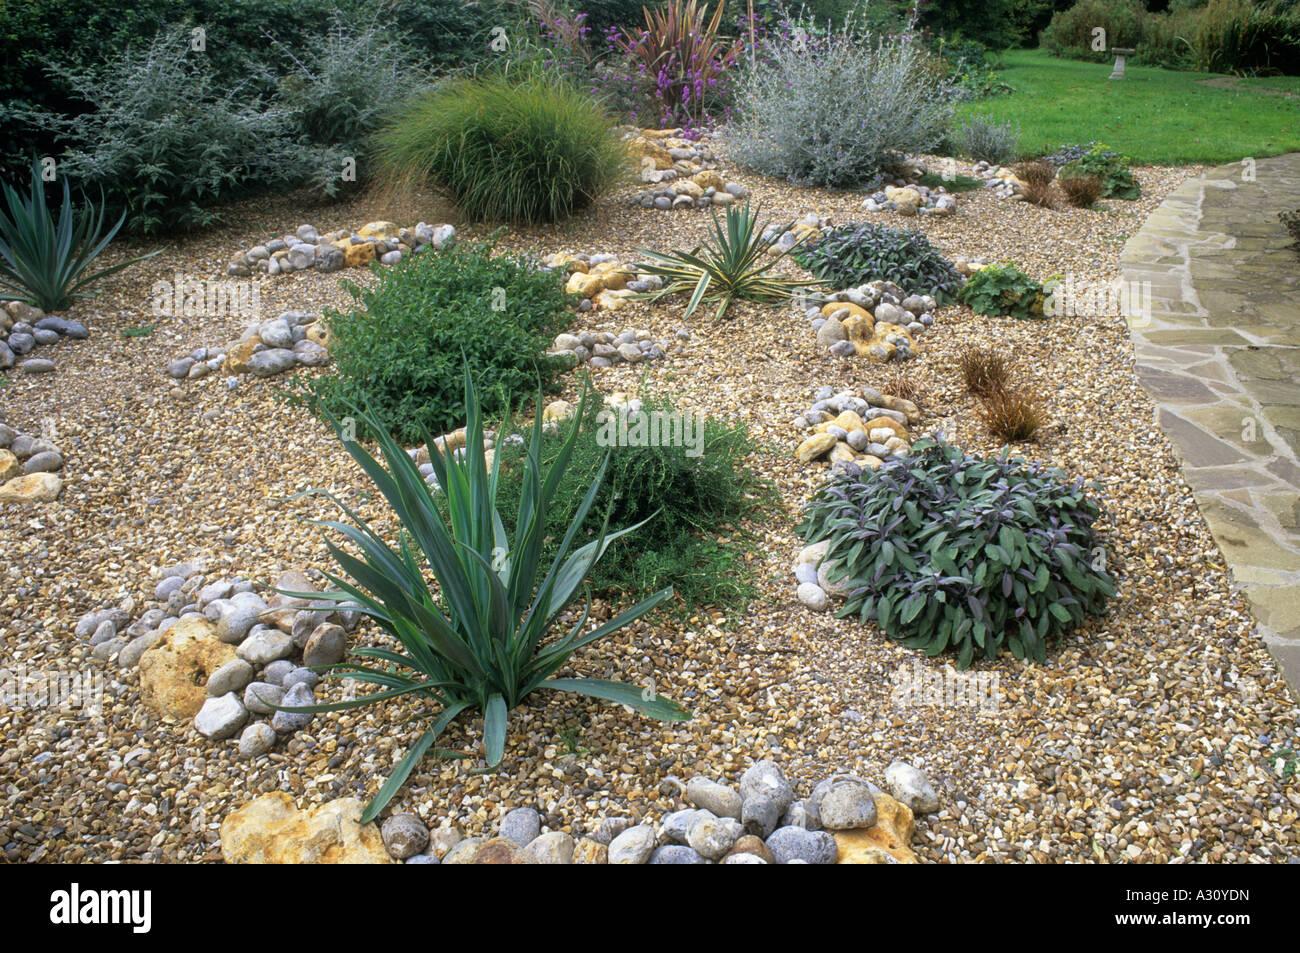 Superieur Gravel Garden Path Lawn Stones Pebbles Drought Tolerant Plants Initial  Planting In New Garden